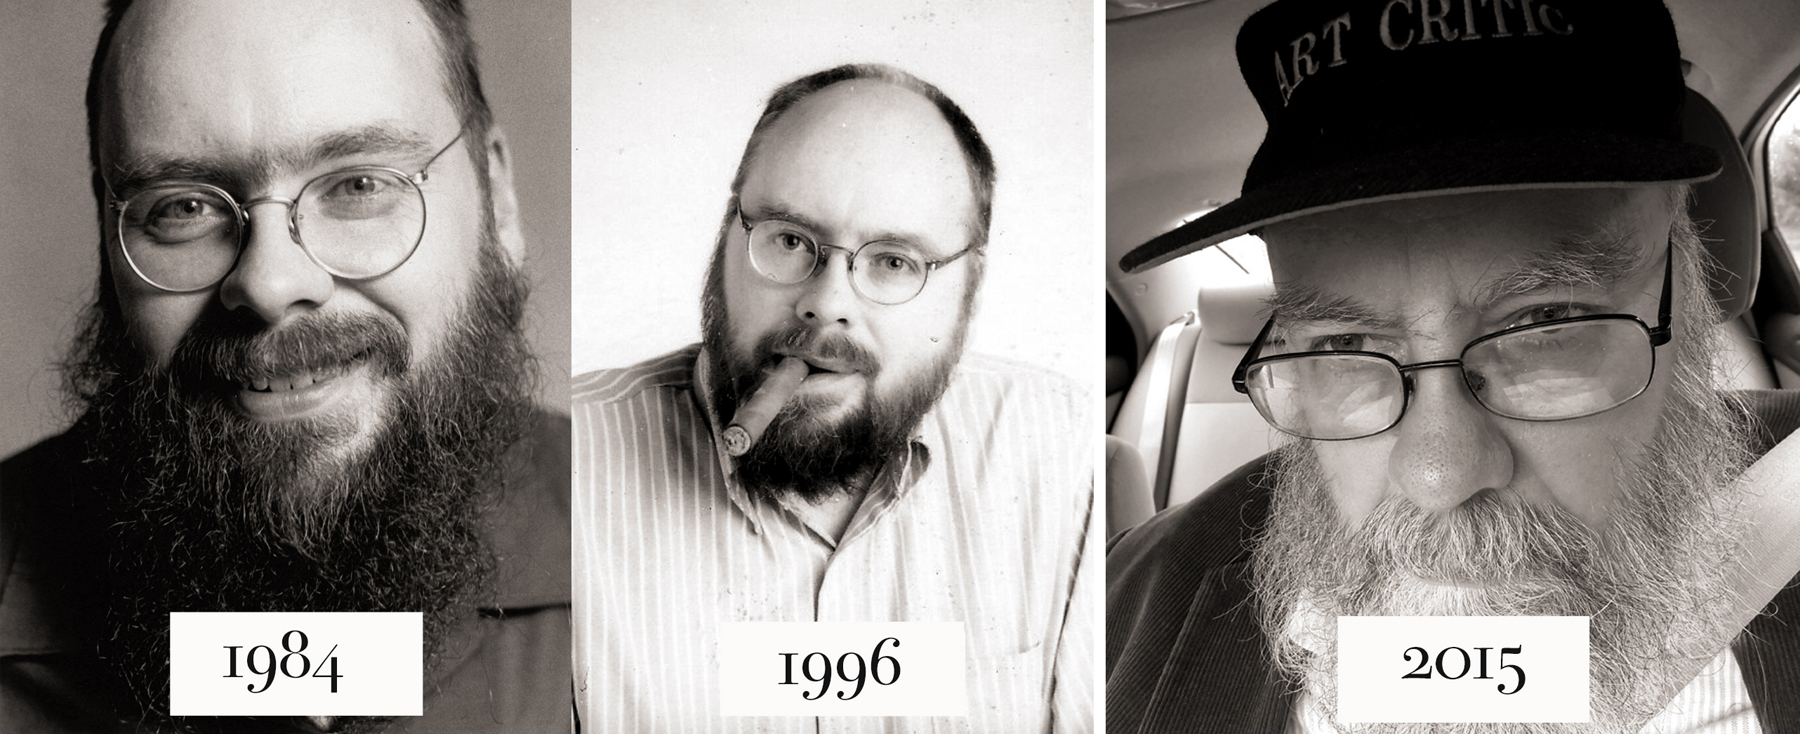 1984-1996-2015